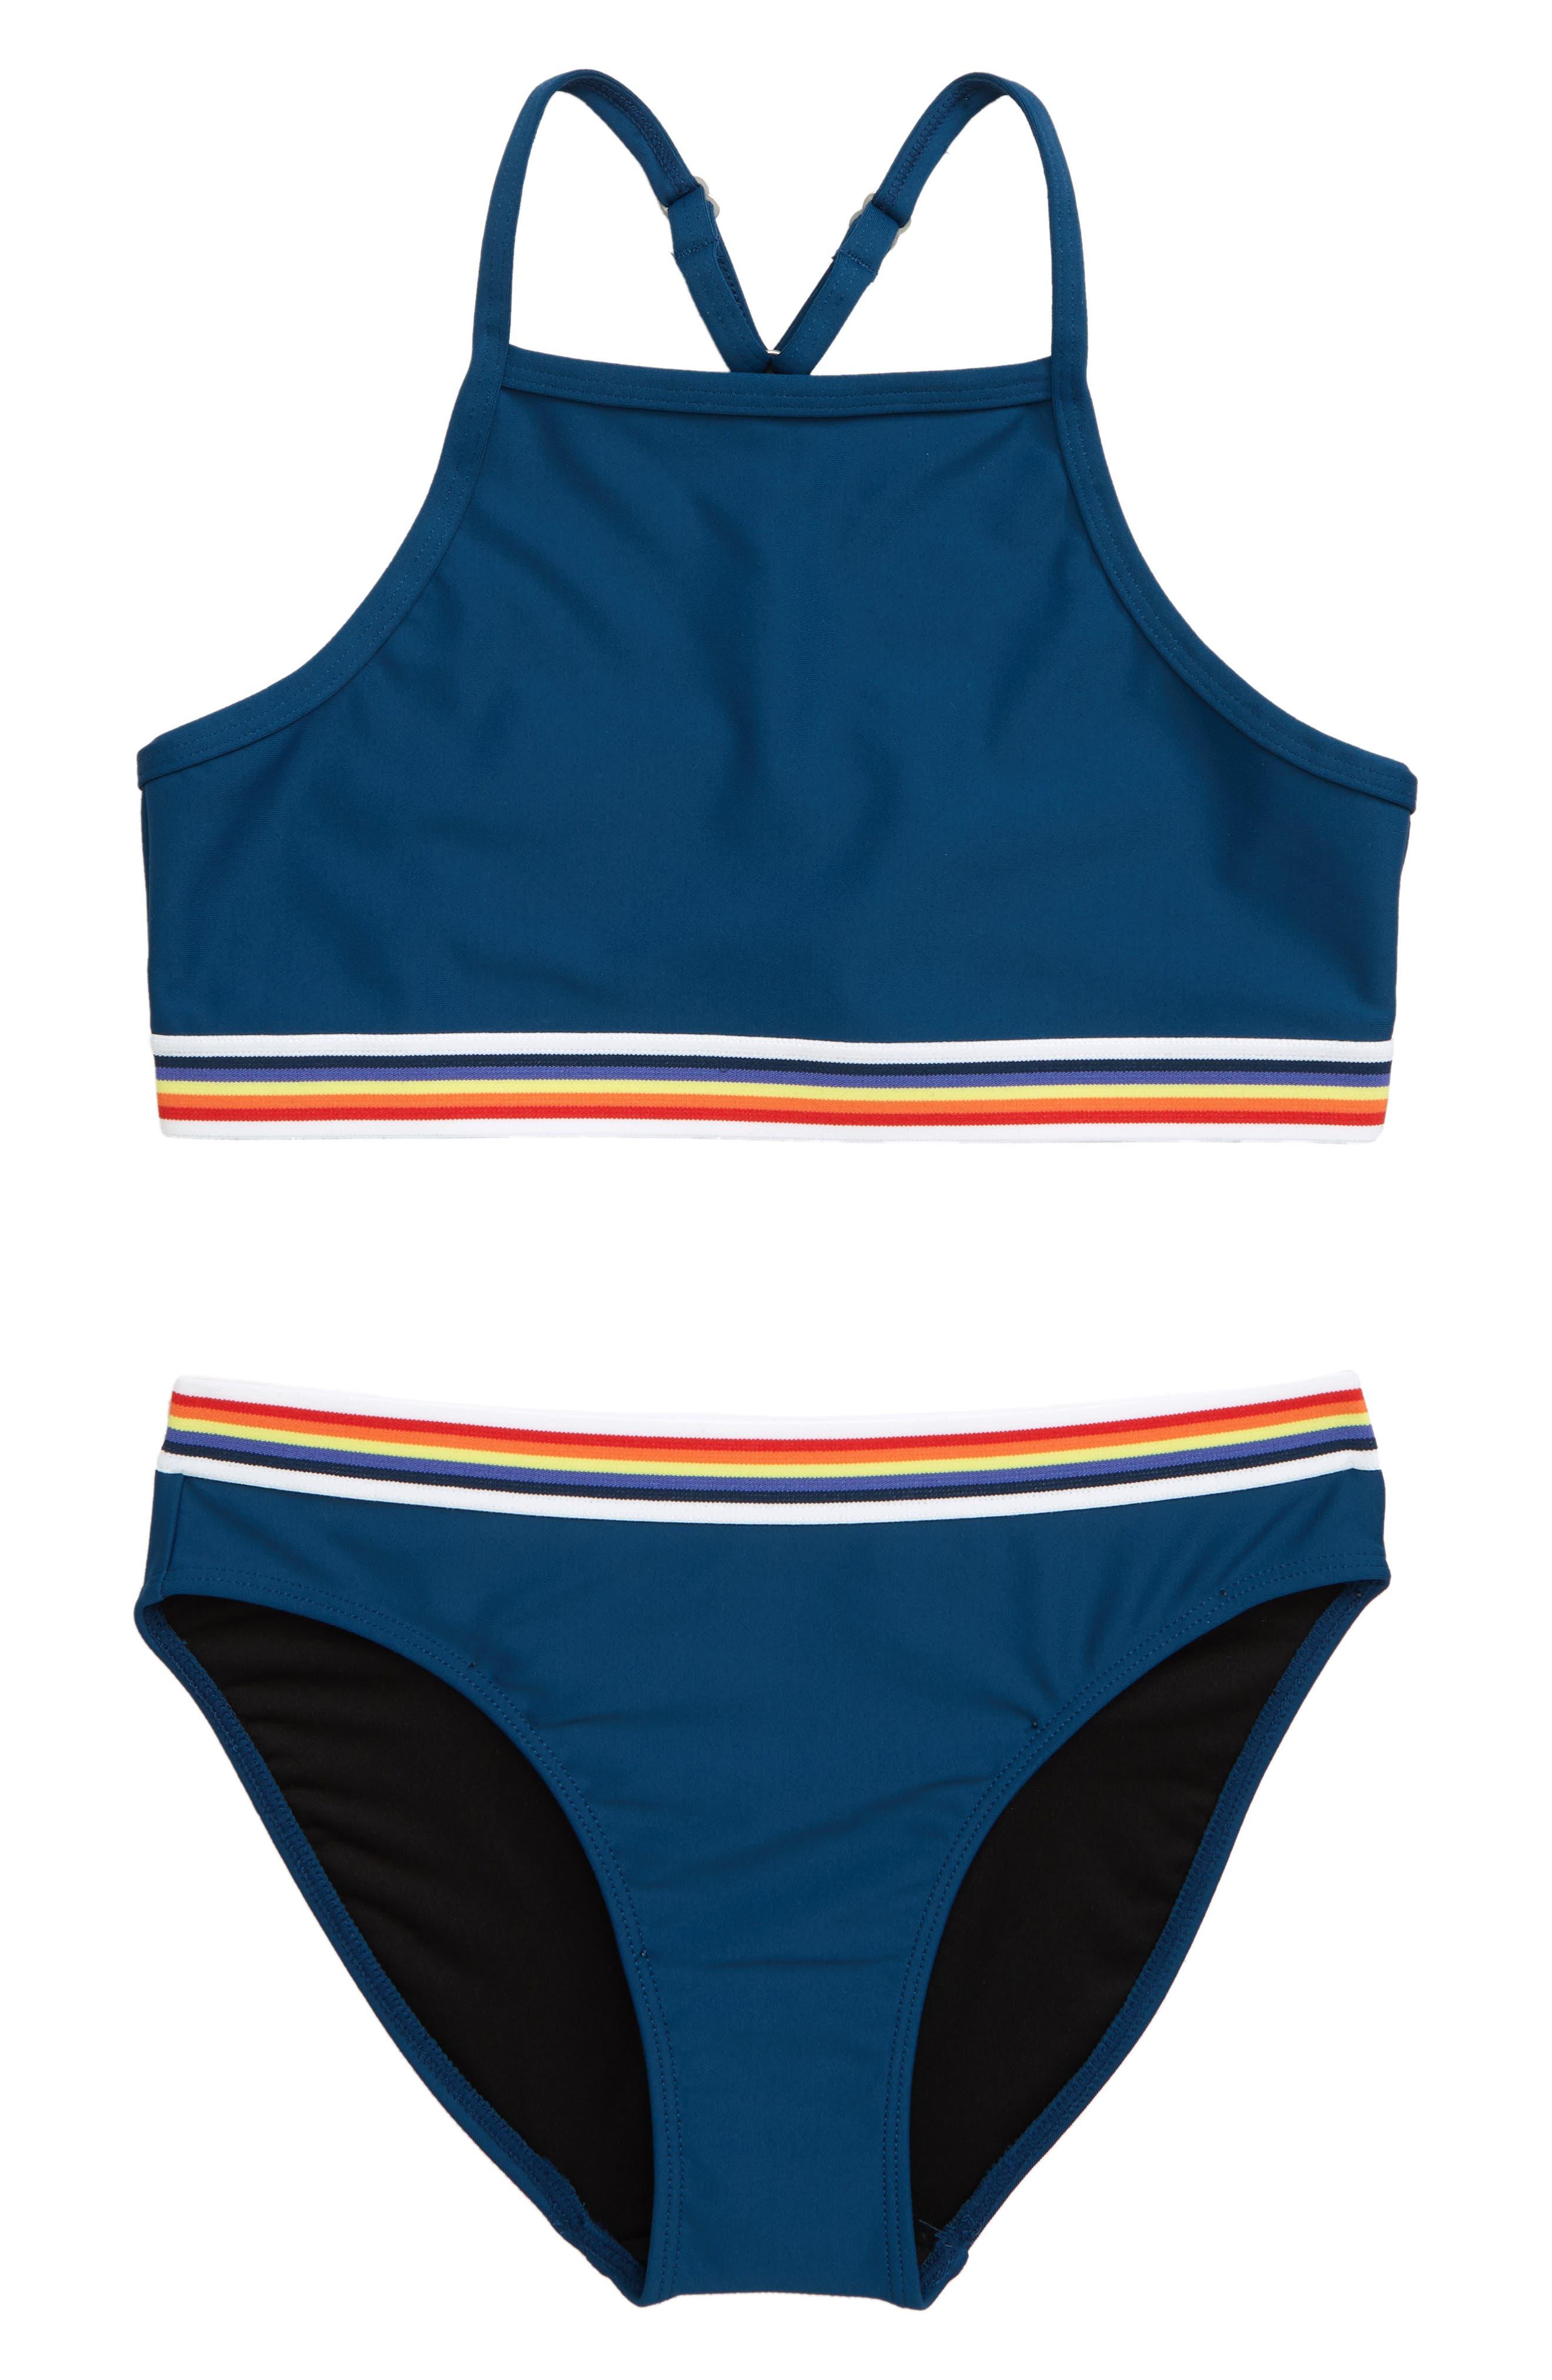 Girls Tankini Swimsuit Flower Printed Rashguard Swimwear Bathing Suit Bikini Set